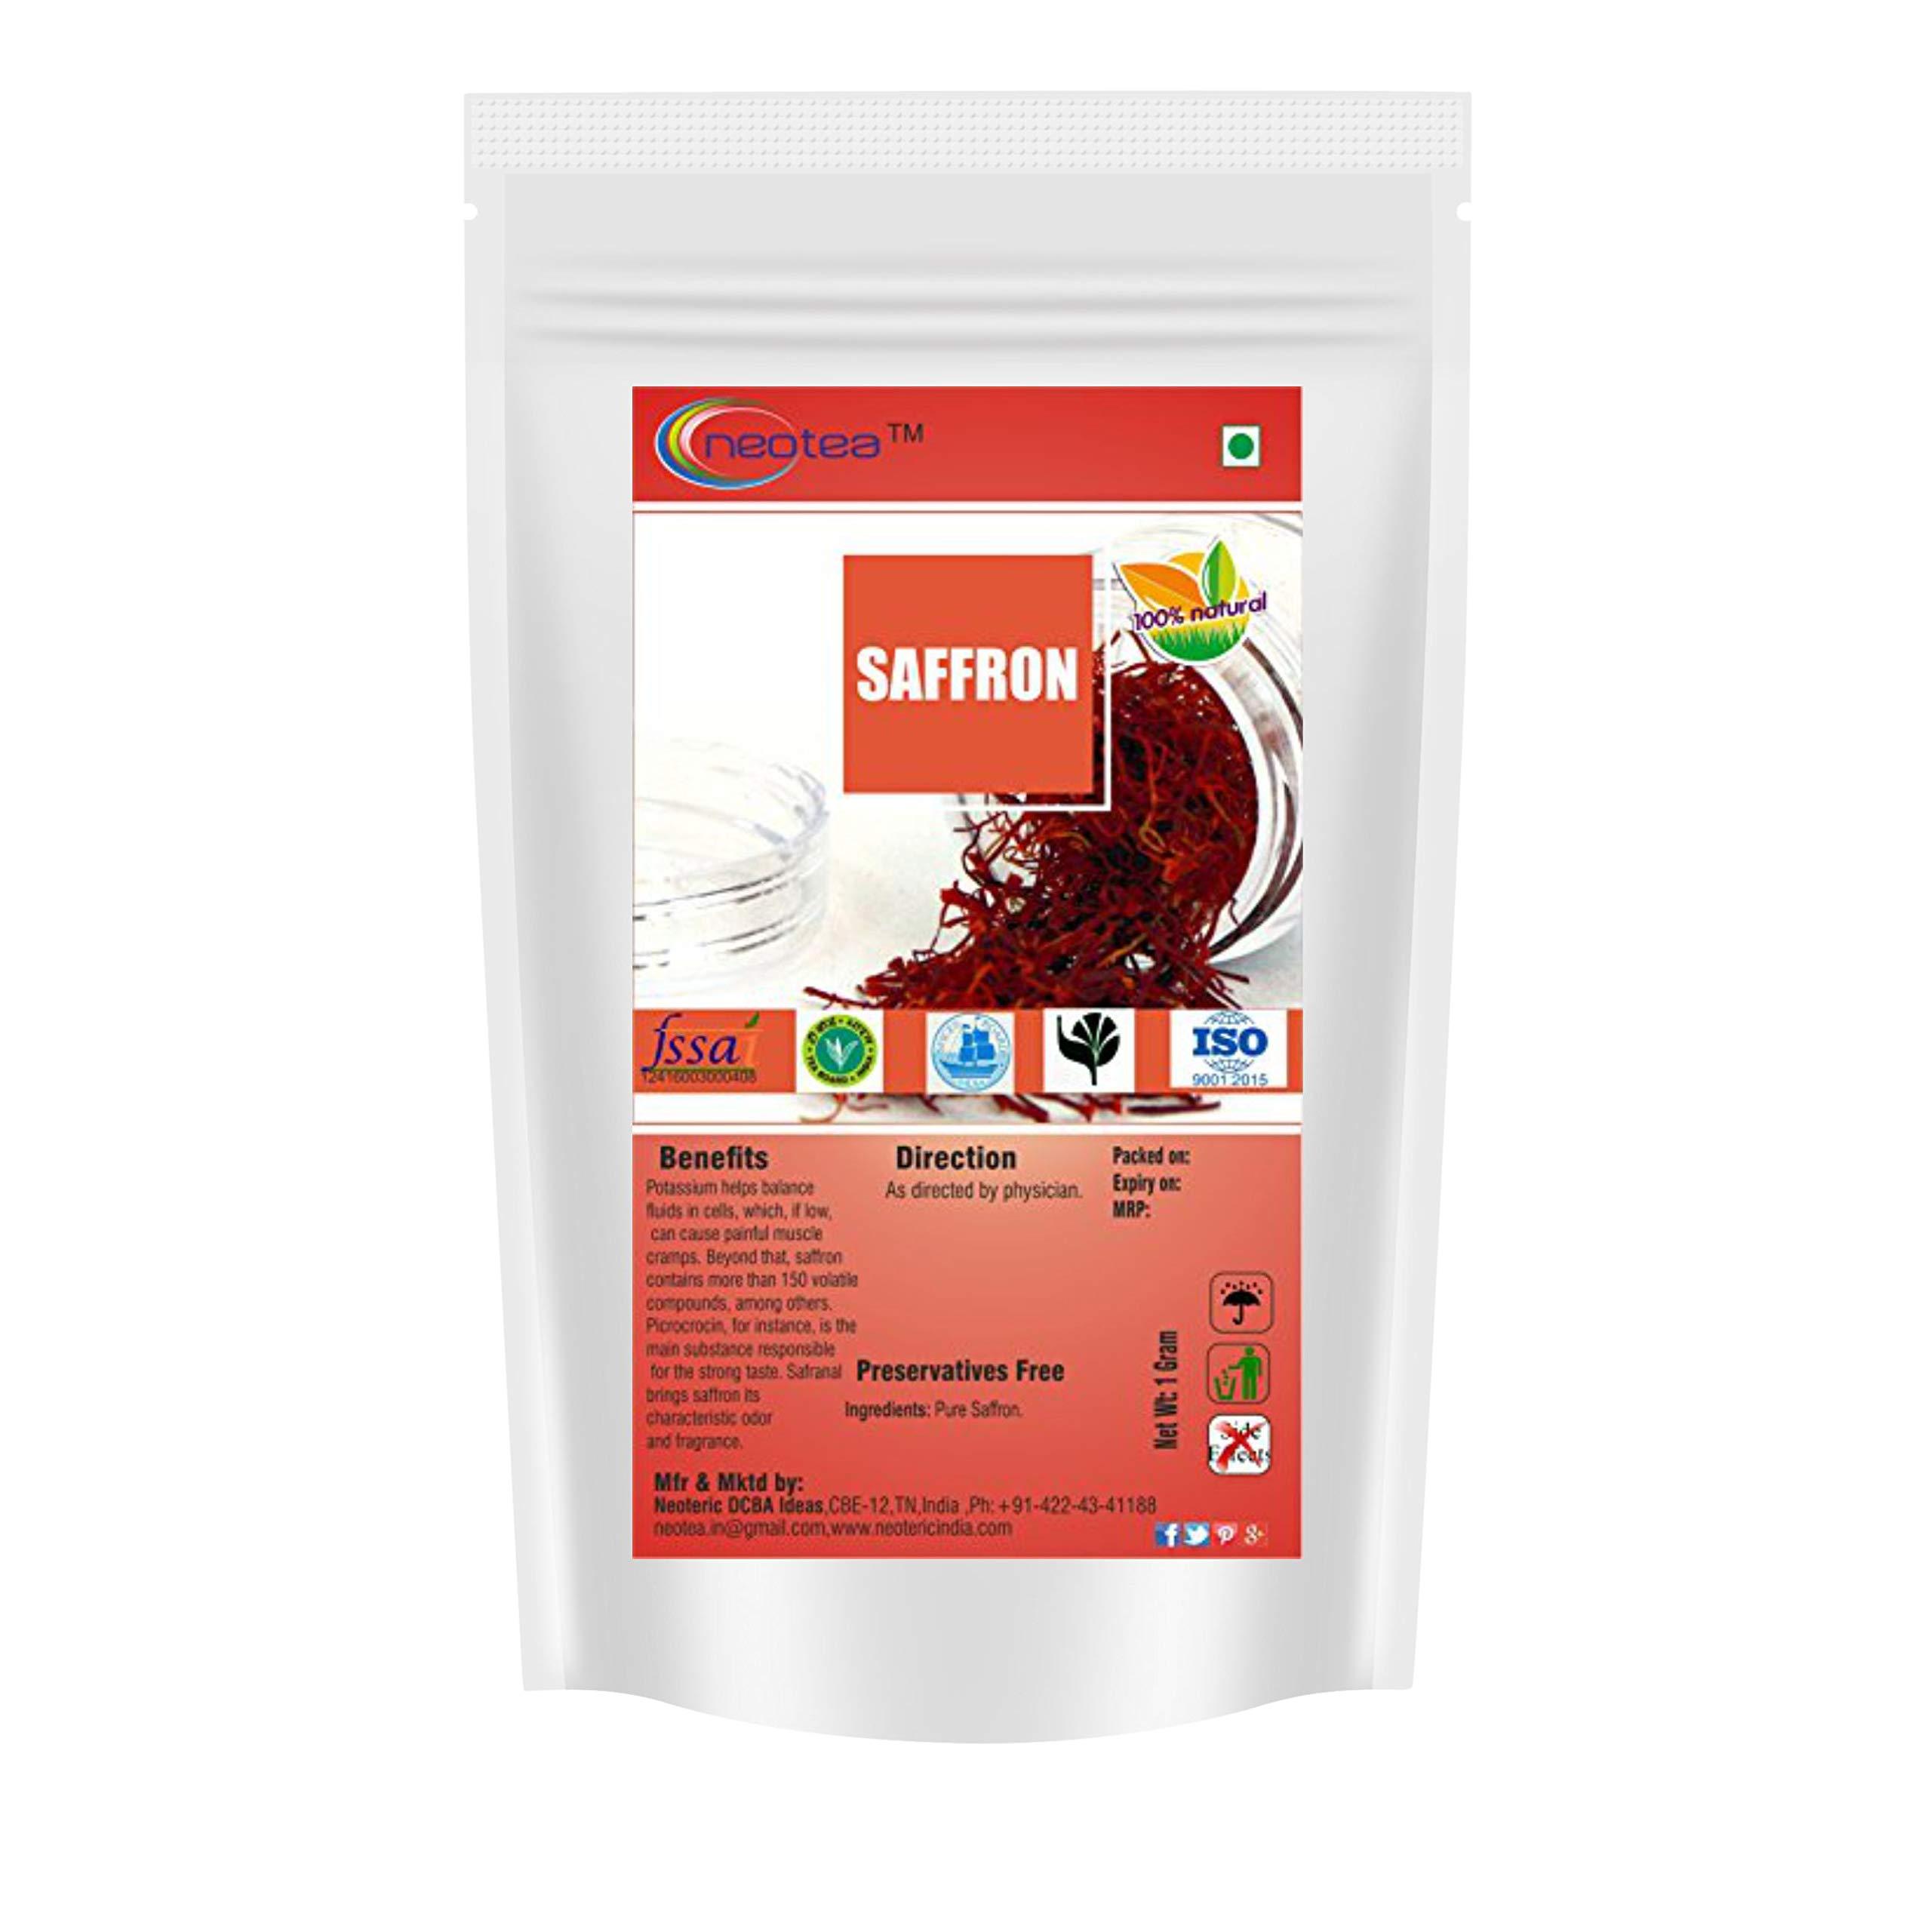 Neotea Pure Saffron (5g)